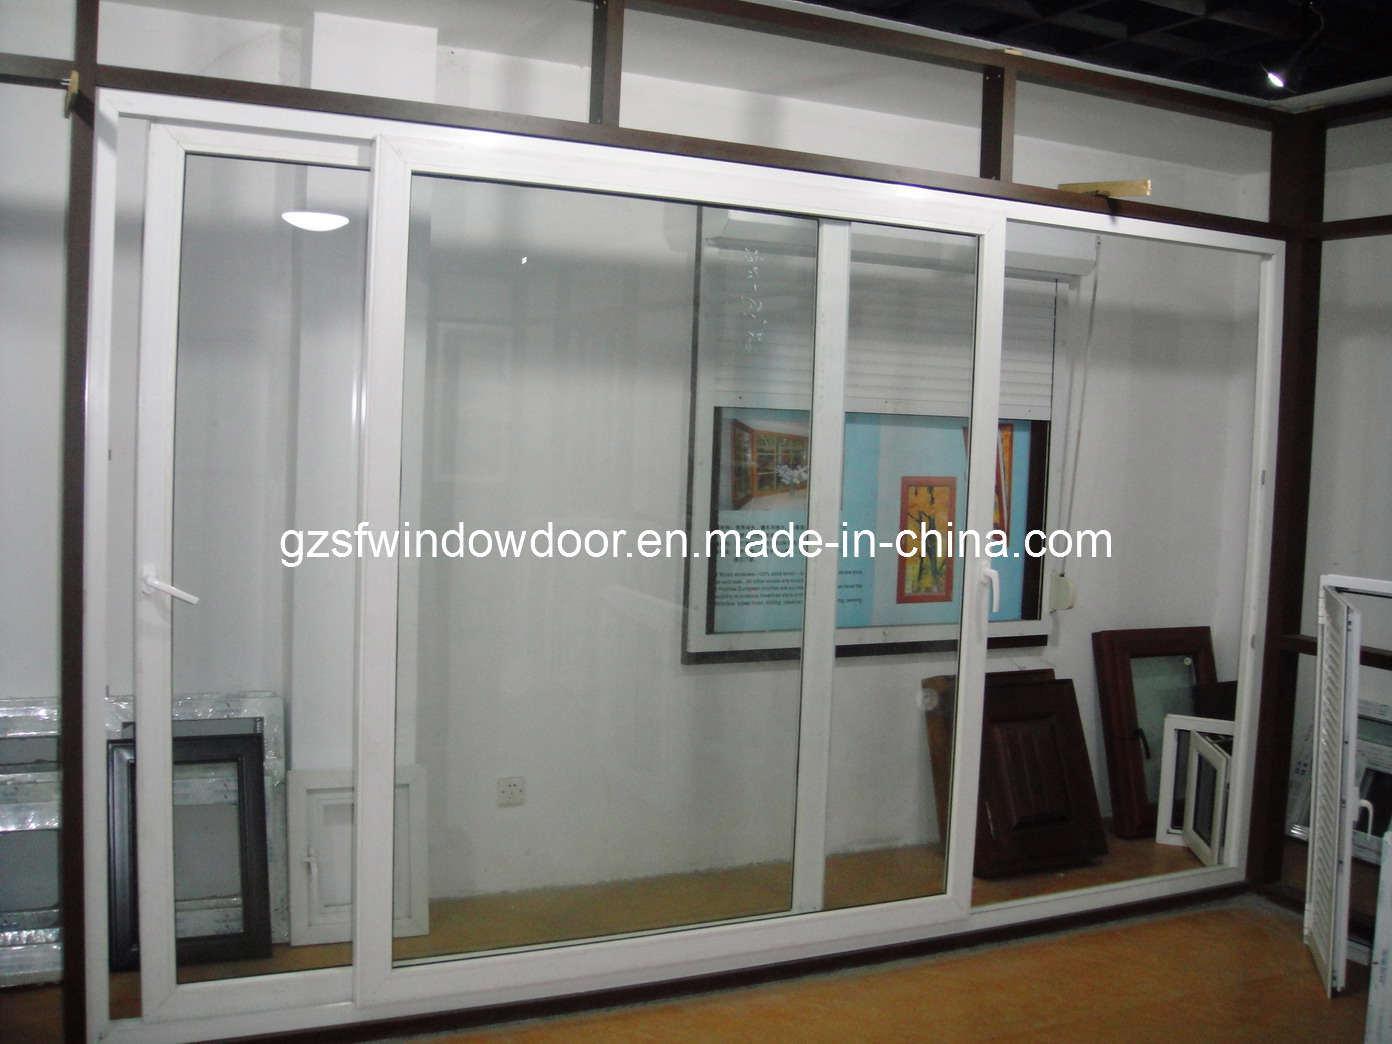 China Pvc Windows : China pvc sliding door window